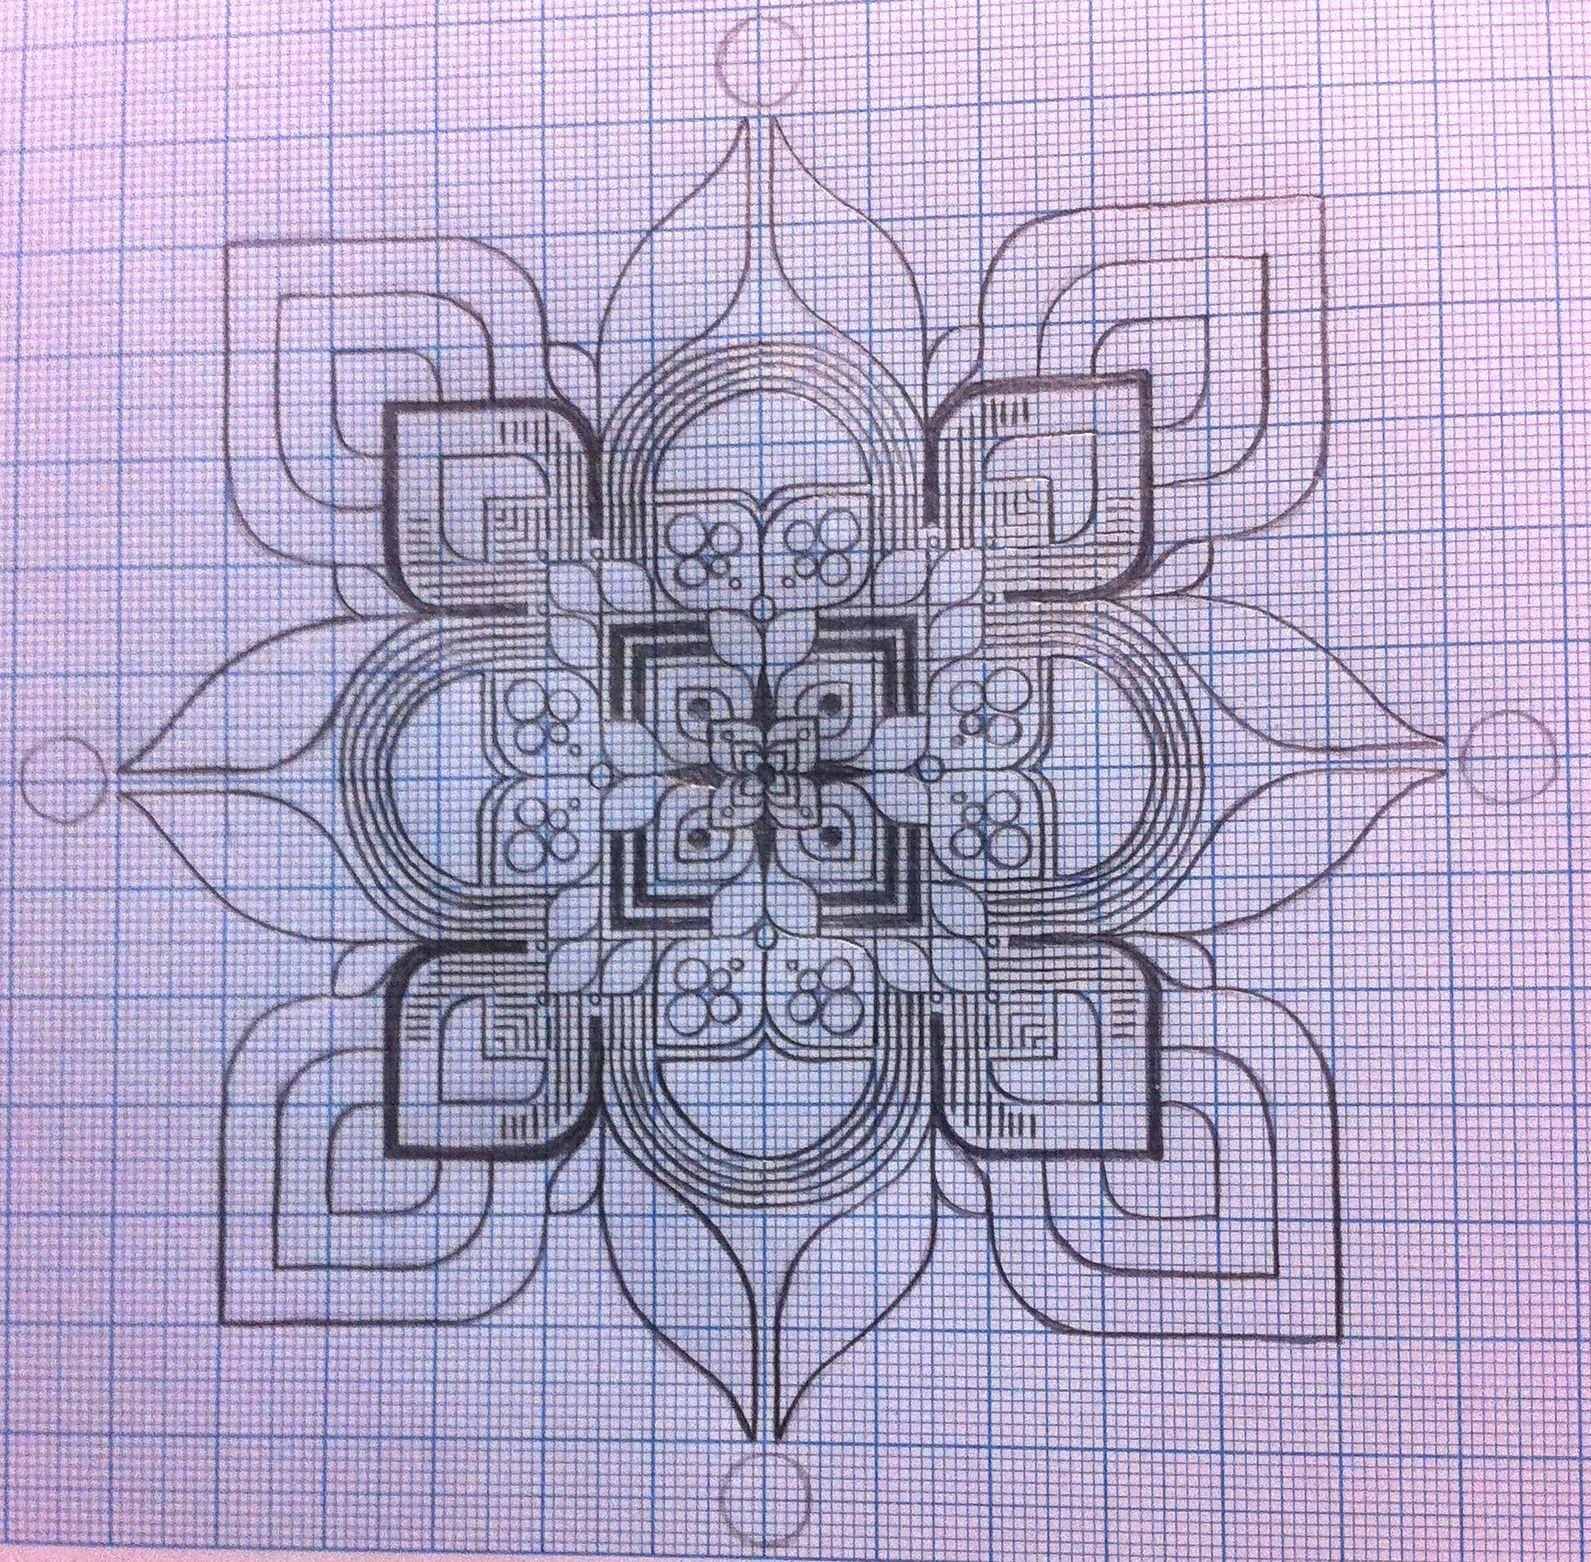 another 'focus' design with a smidgen on Art Nouveau influence